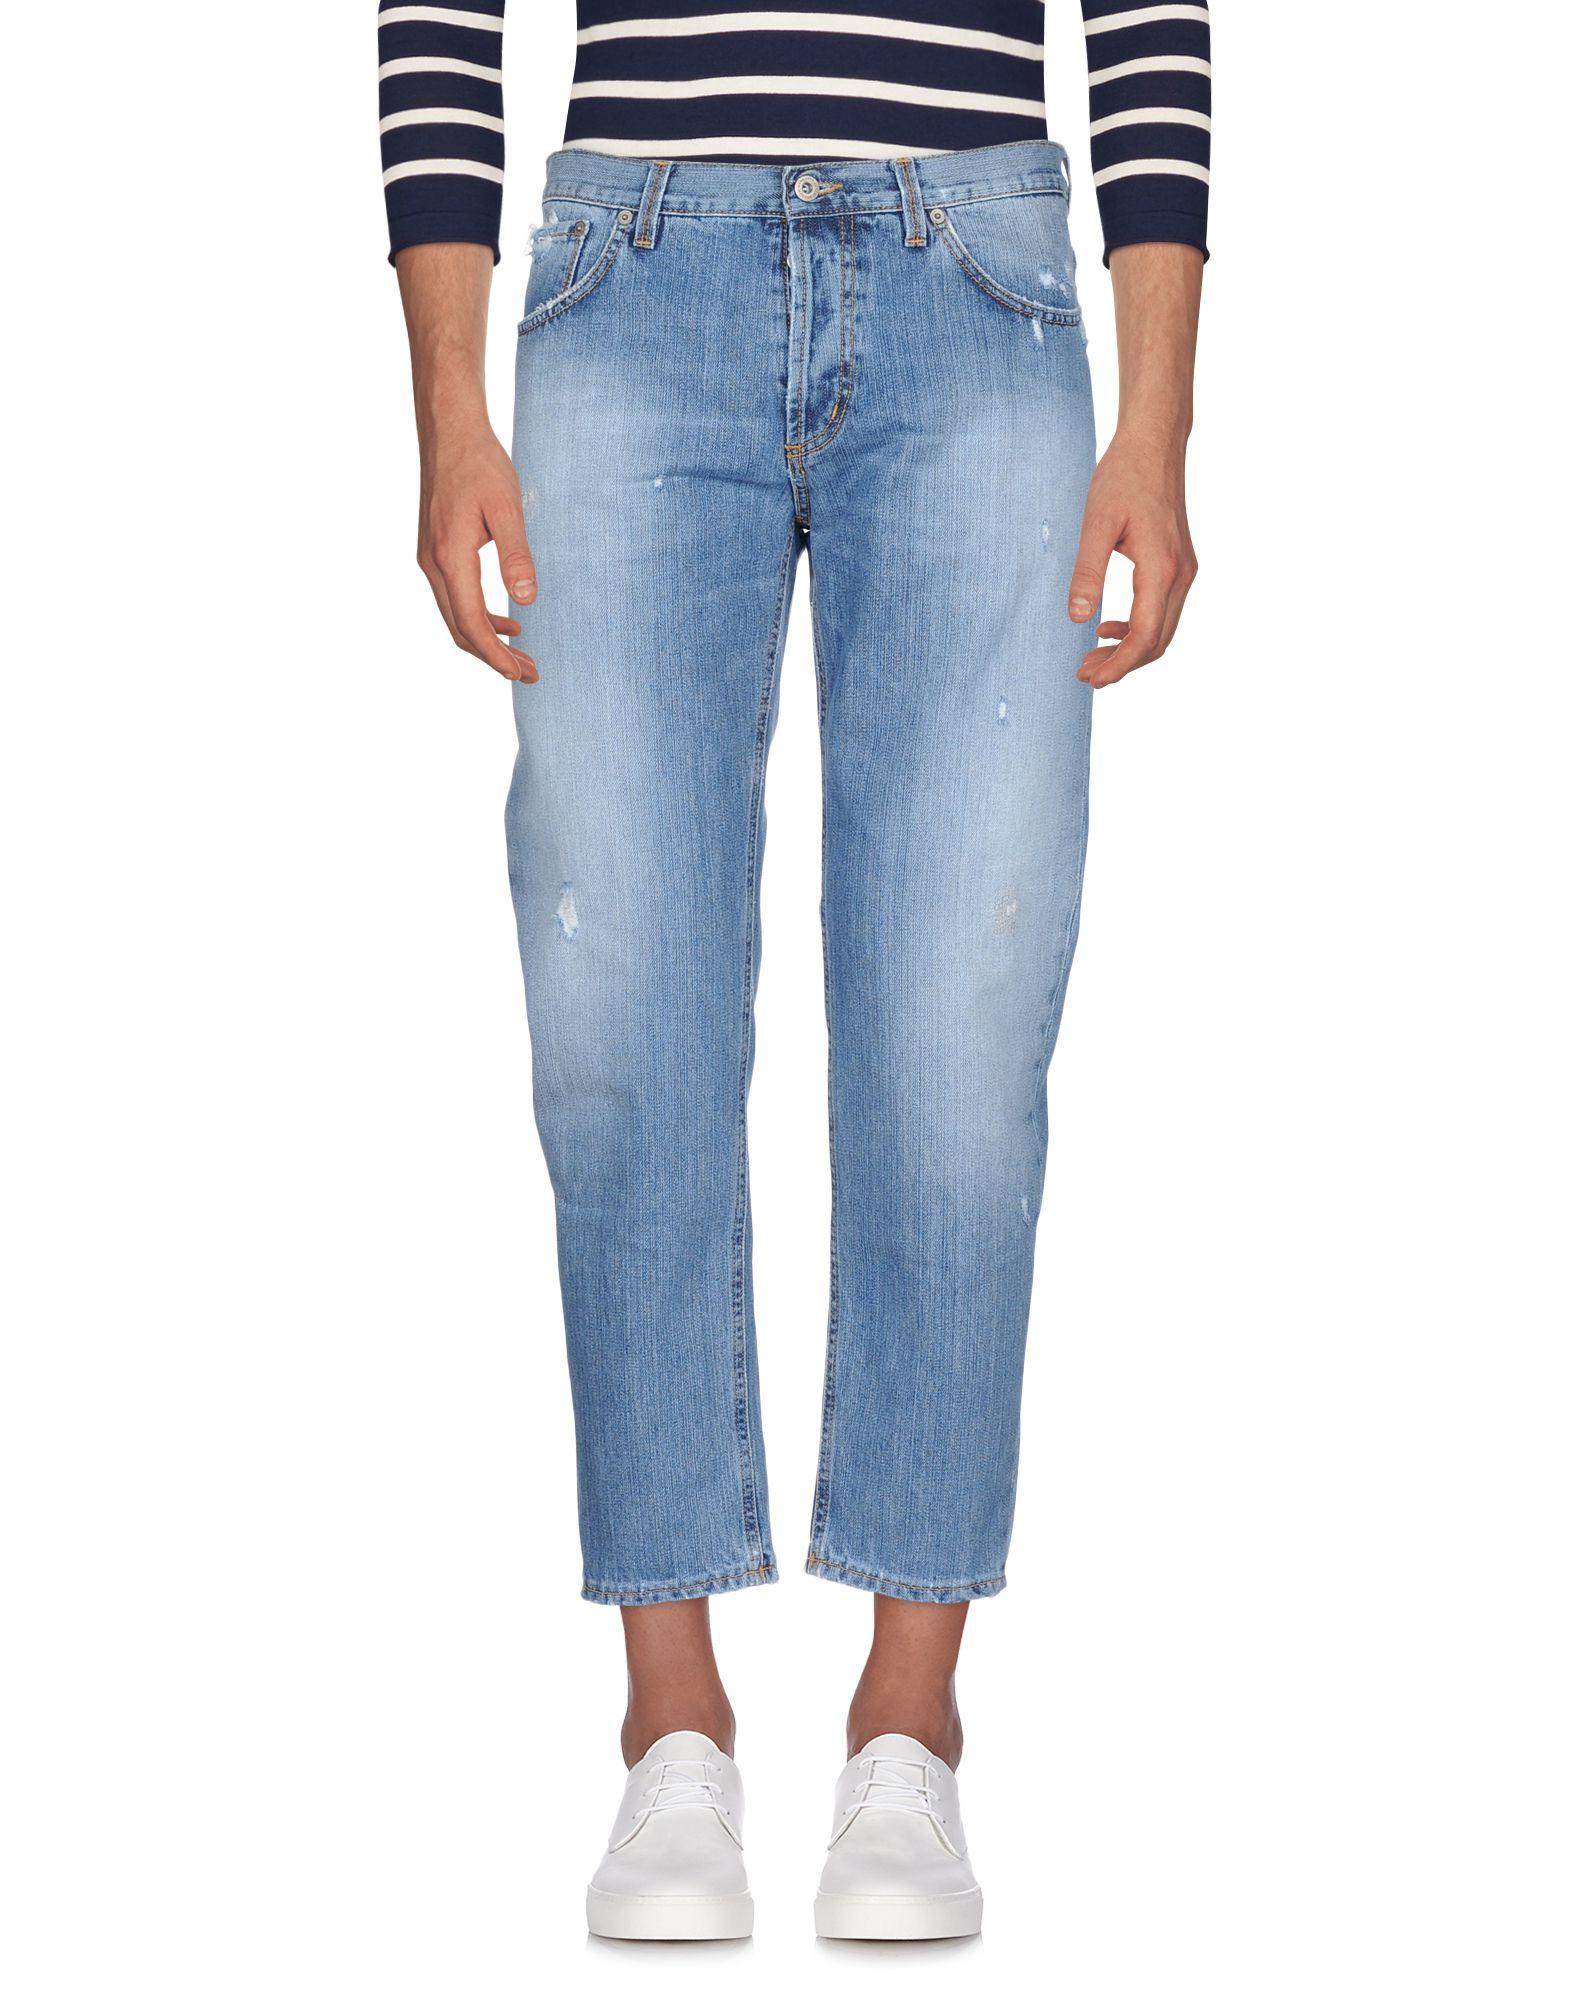 Pantaloni Jeans Dondup Uomo - Acquista online su